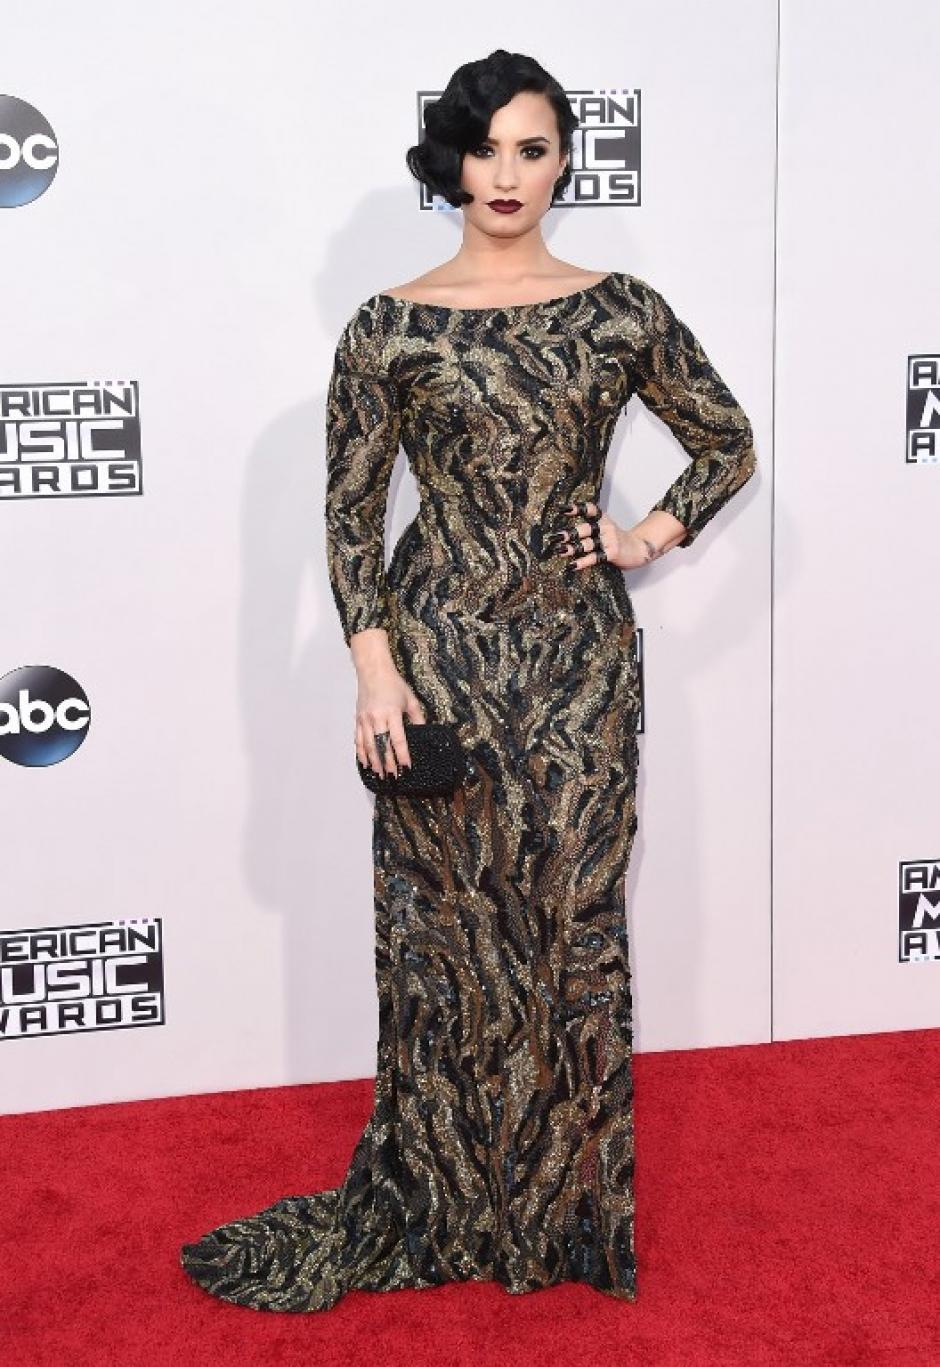 La cantante Demi Lovato luce su belleza en la alfombra roja de los American Music Awards. (Foto: Jason Merritt / AFP)